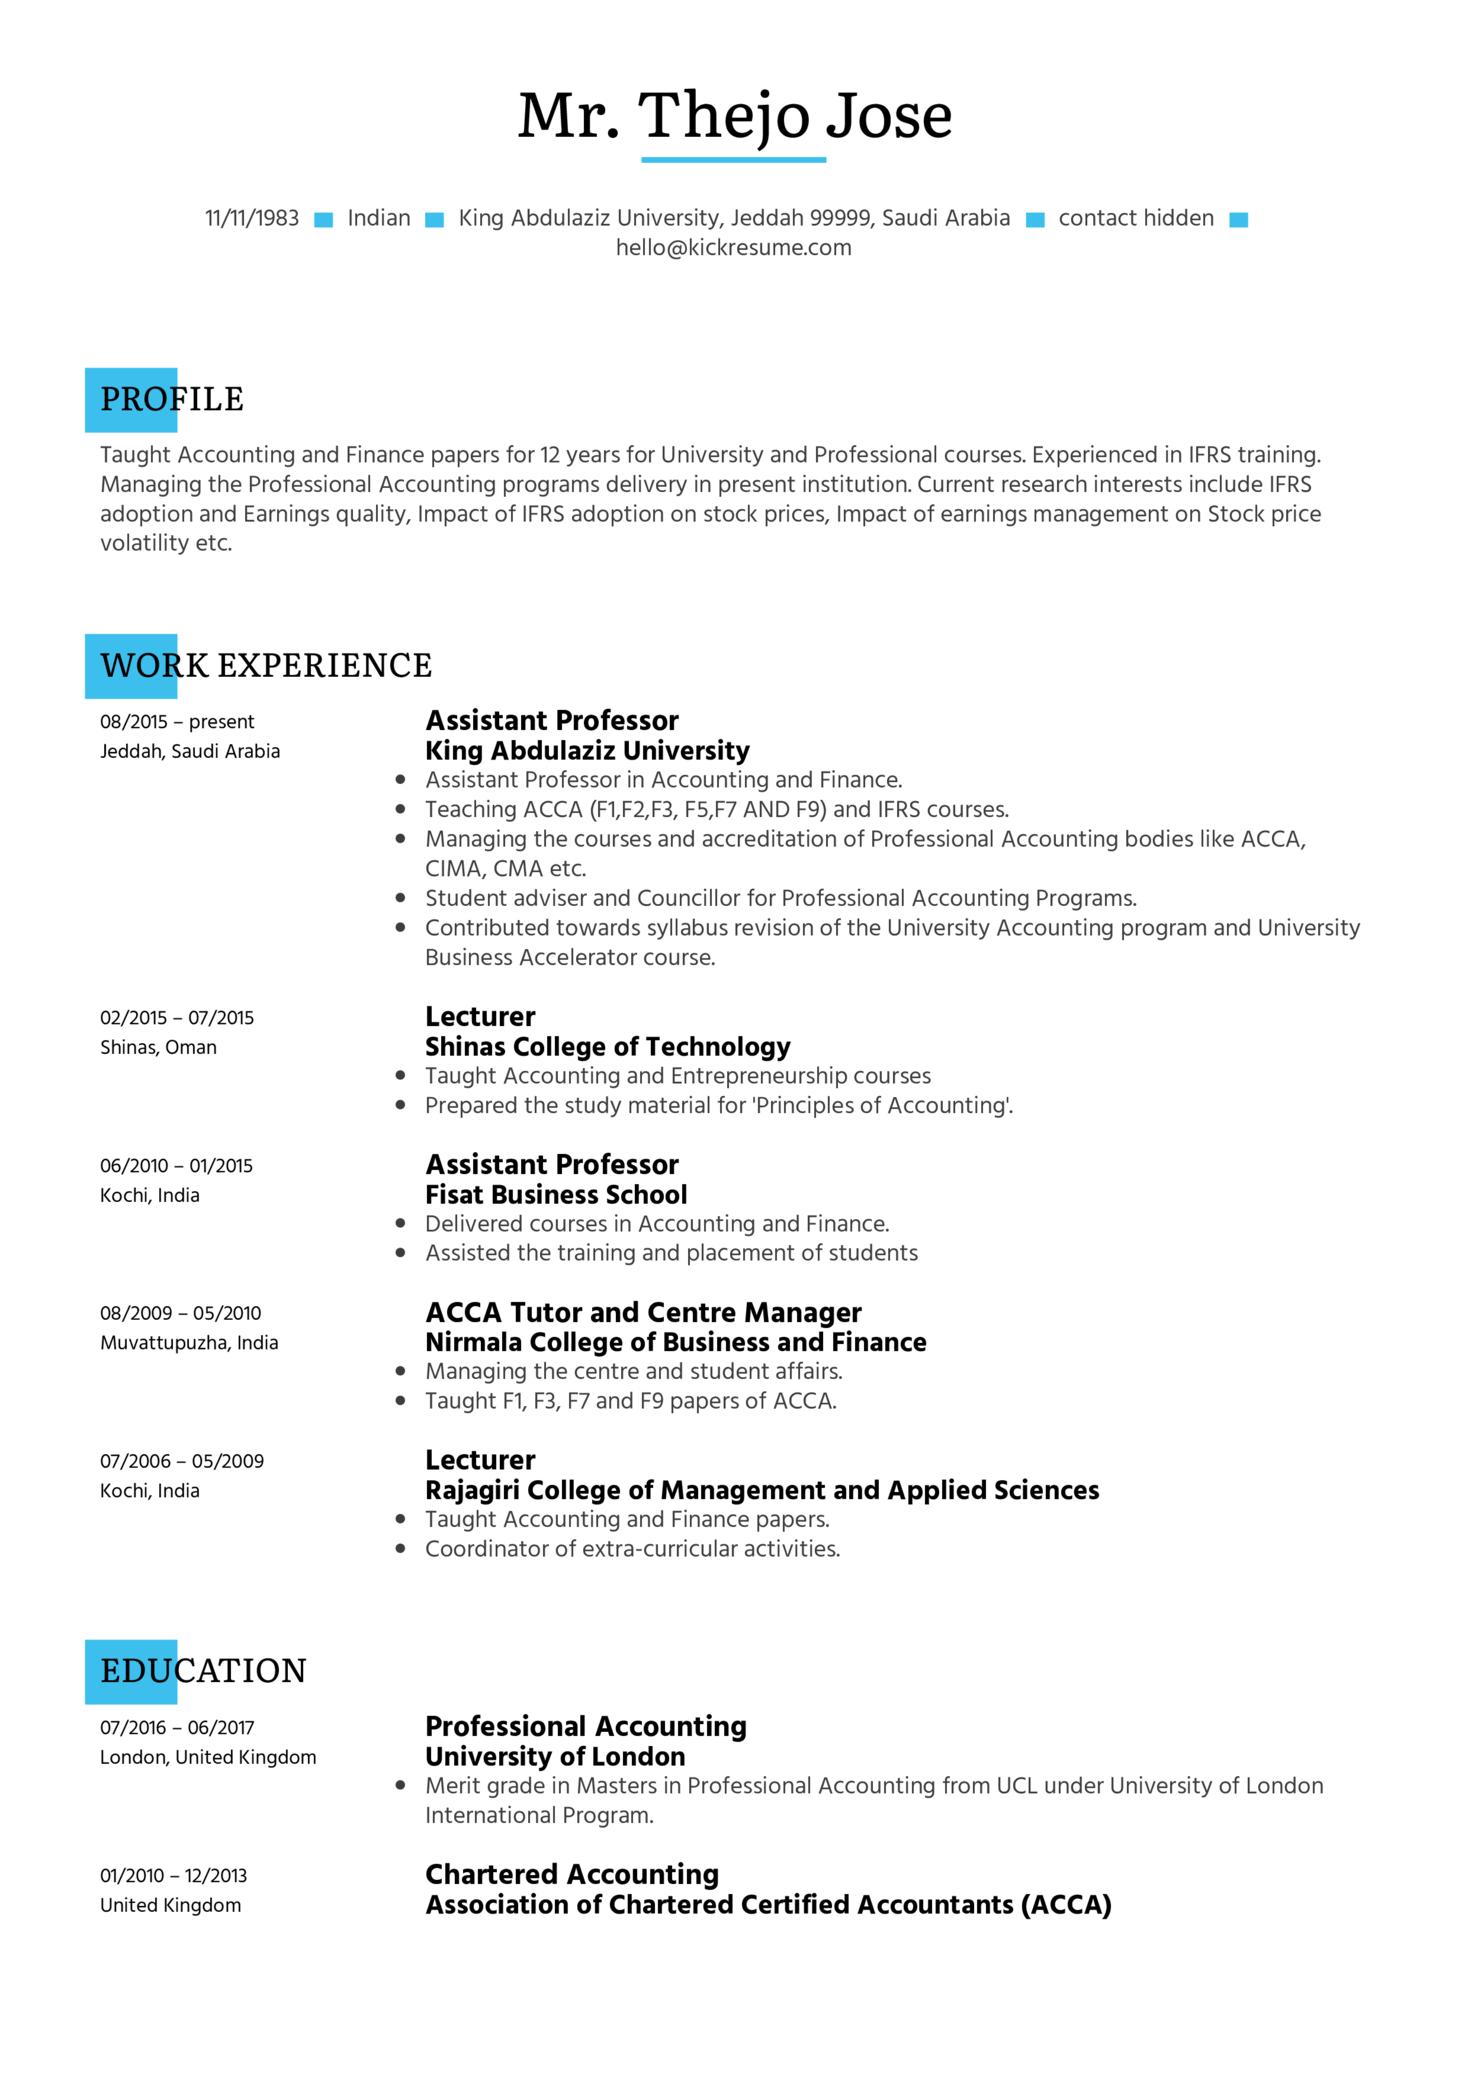 Assistant Professor Resume Sample (Part 1)